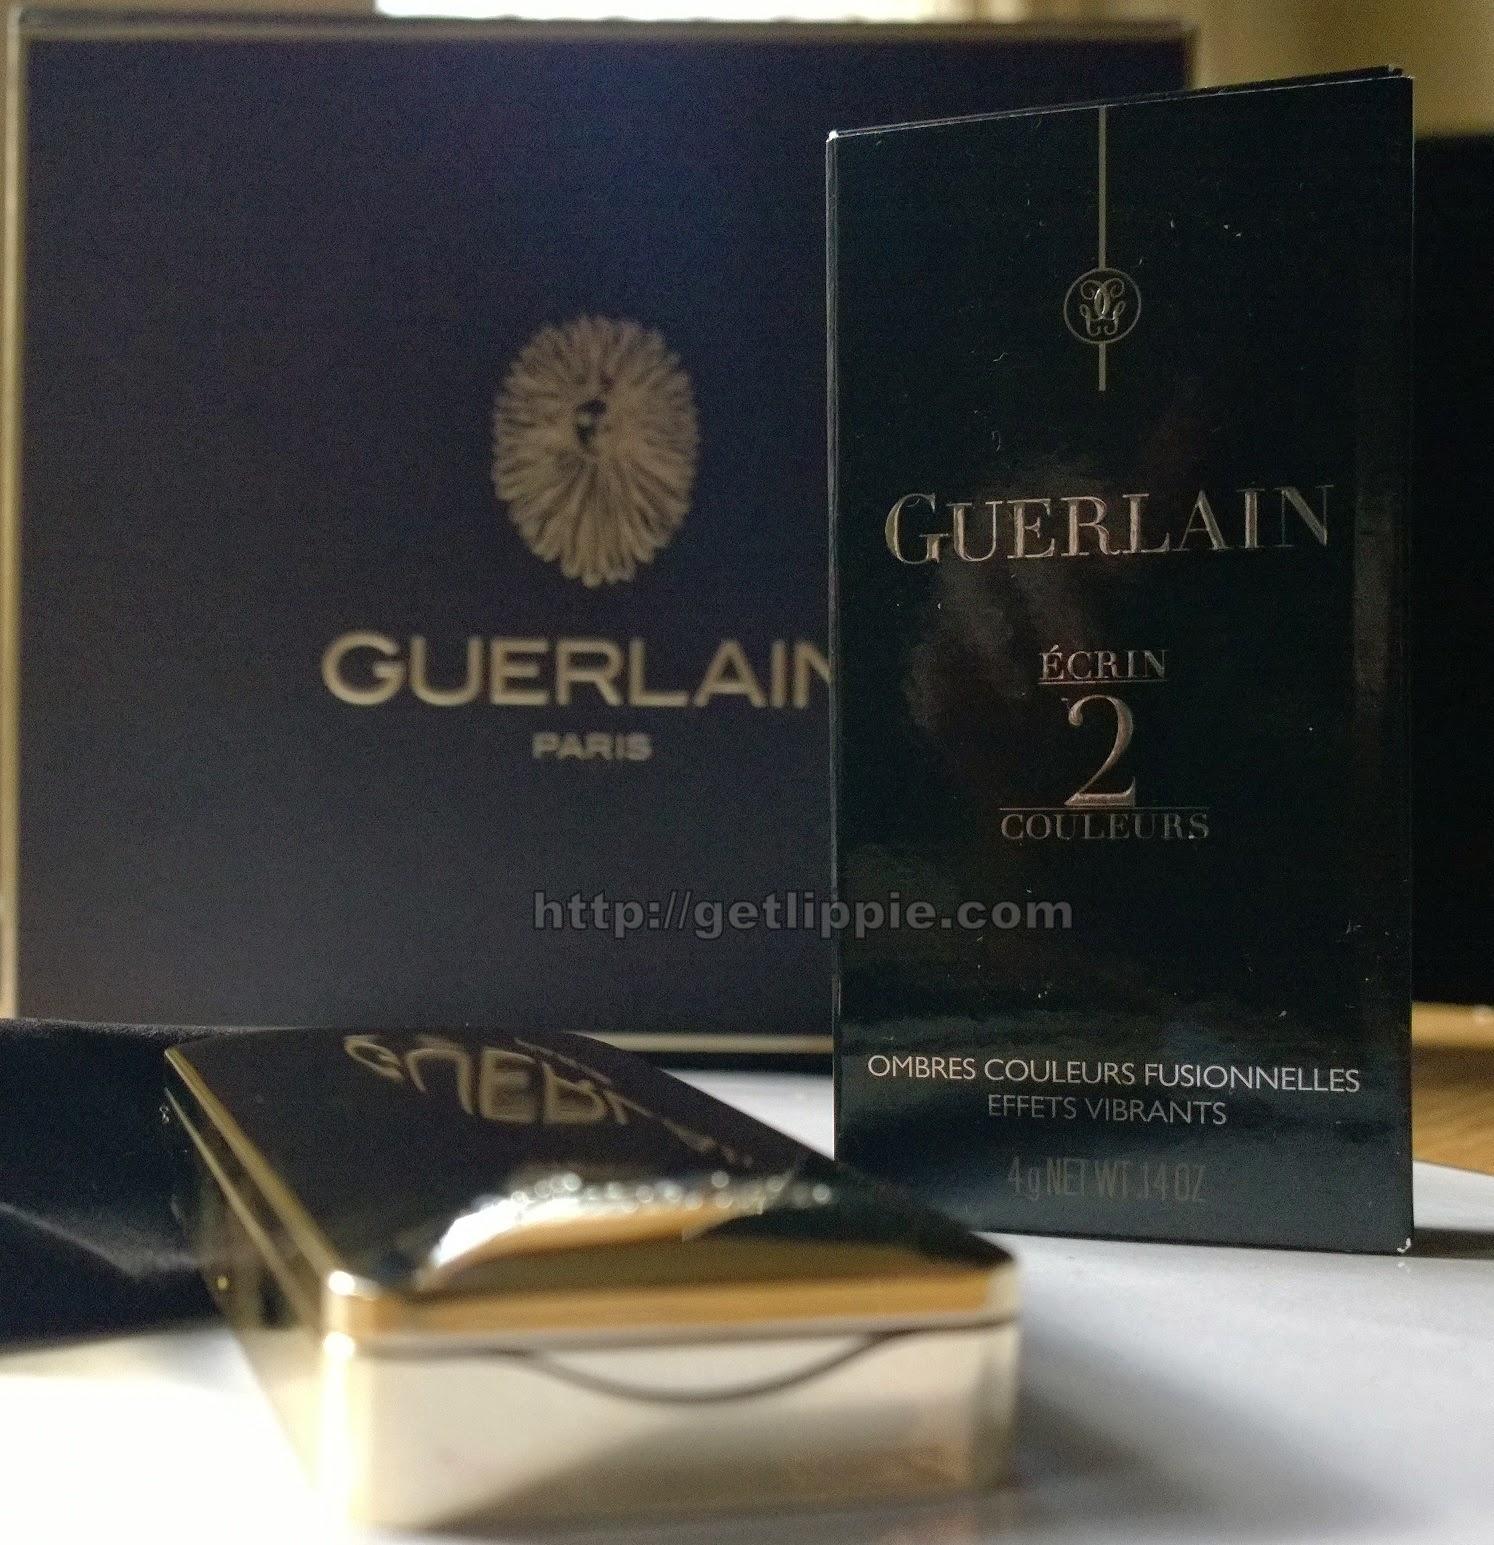 Guerlain Christmas 2014 -  L'Ecrin 2 Couleurs in Cygne Noir